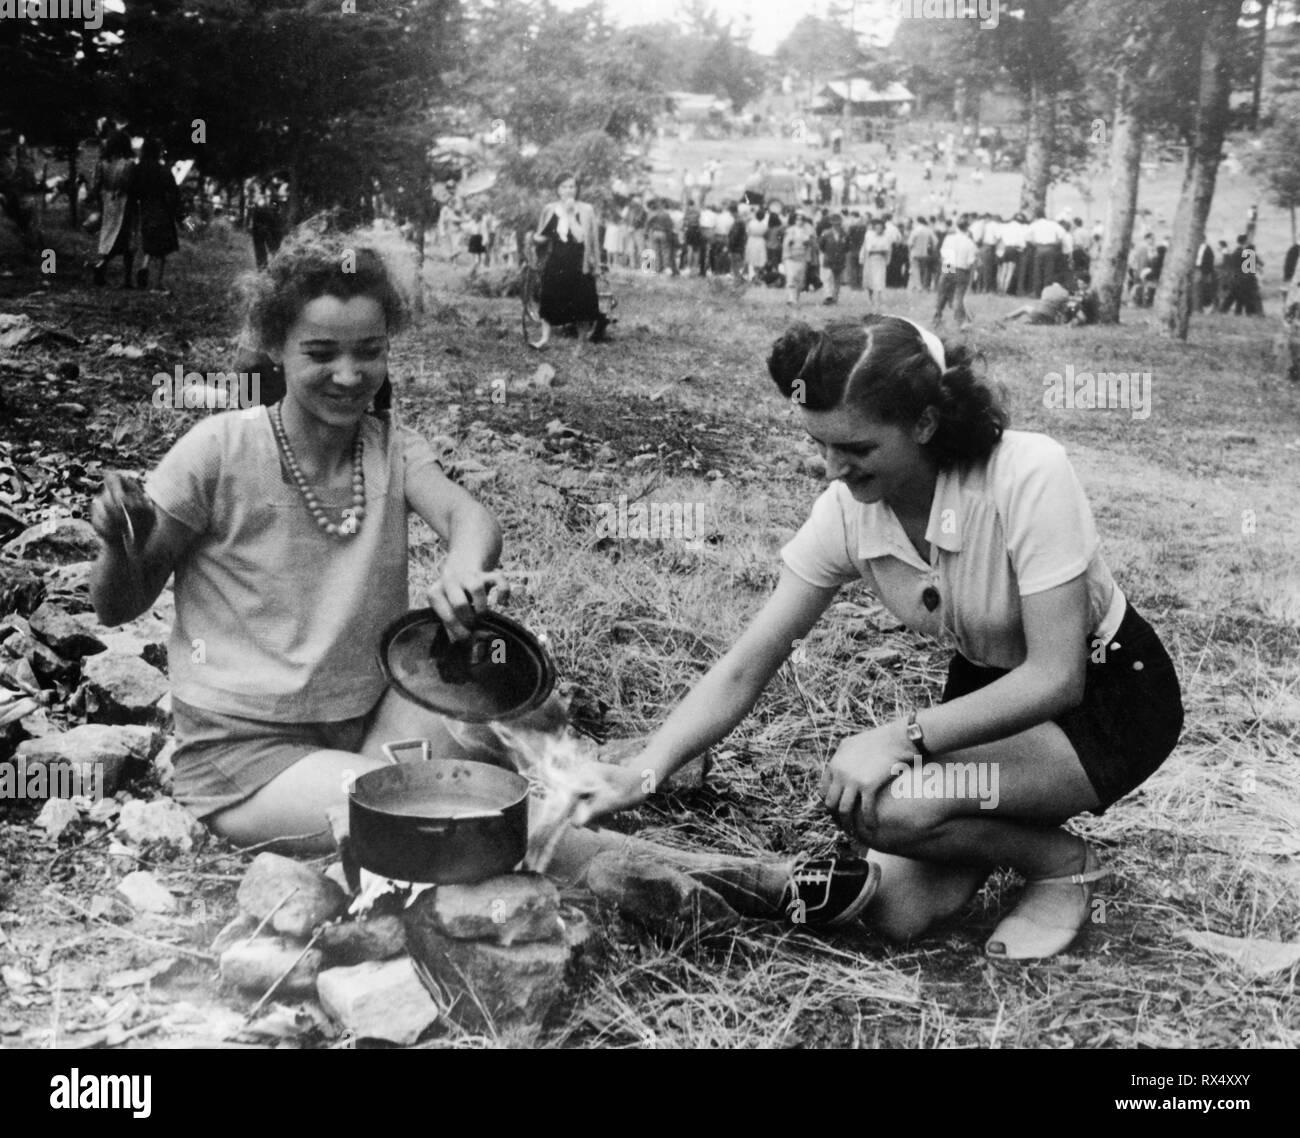 people, annual festival, macchia antonini, tuscany, italy, 1953 - Stock Image